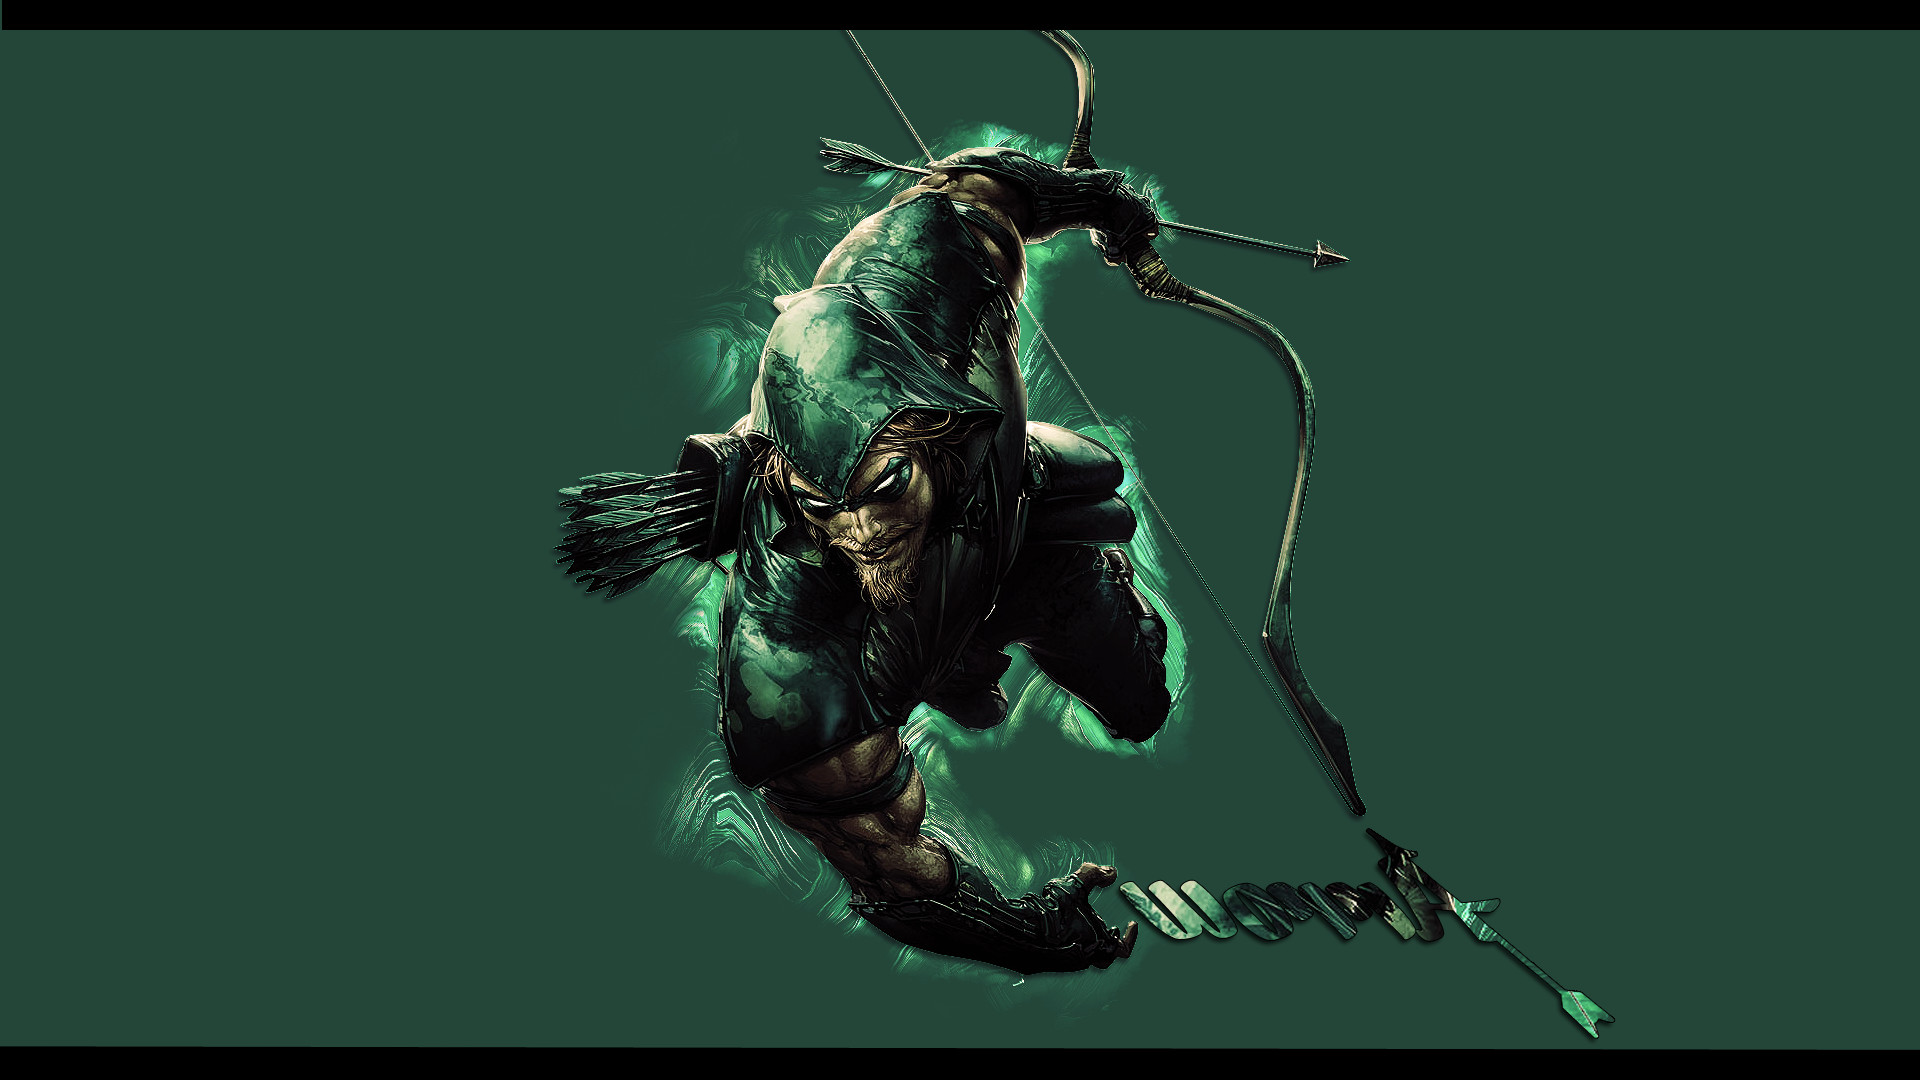 Arrow, DC Comics, Superhero, Green Arrow, Oliver Queen Wallpapers HD